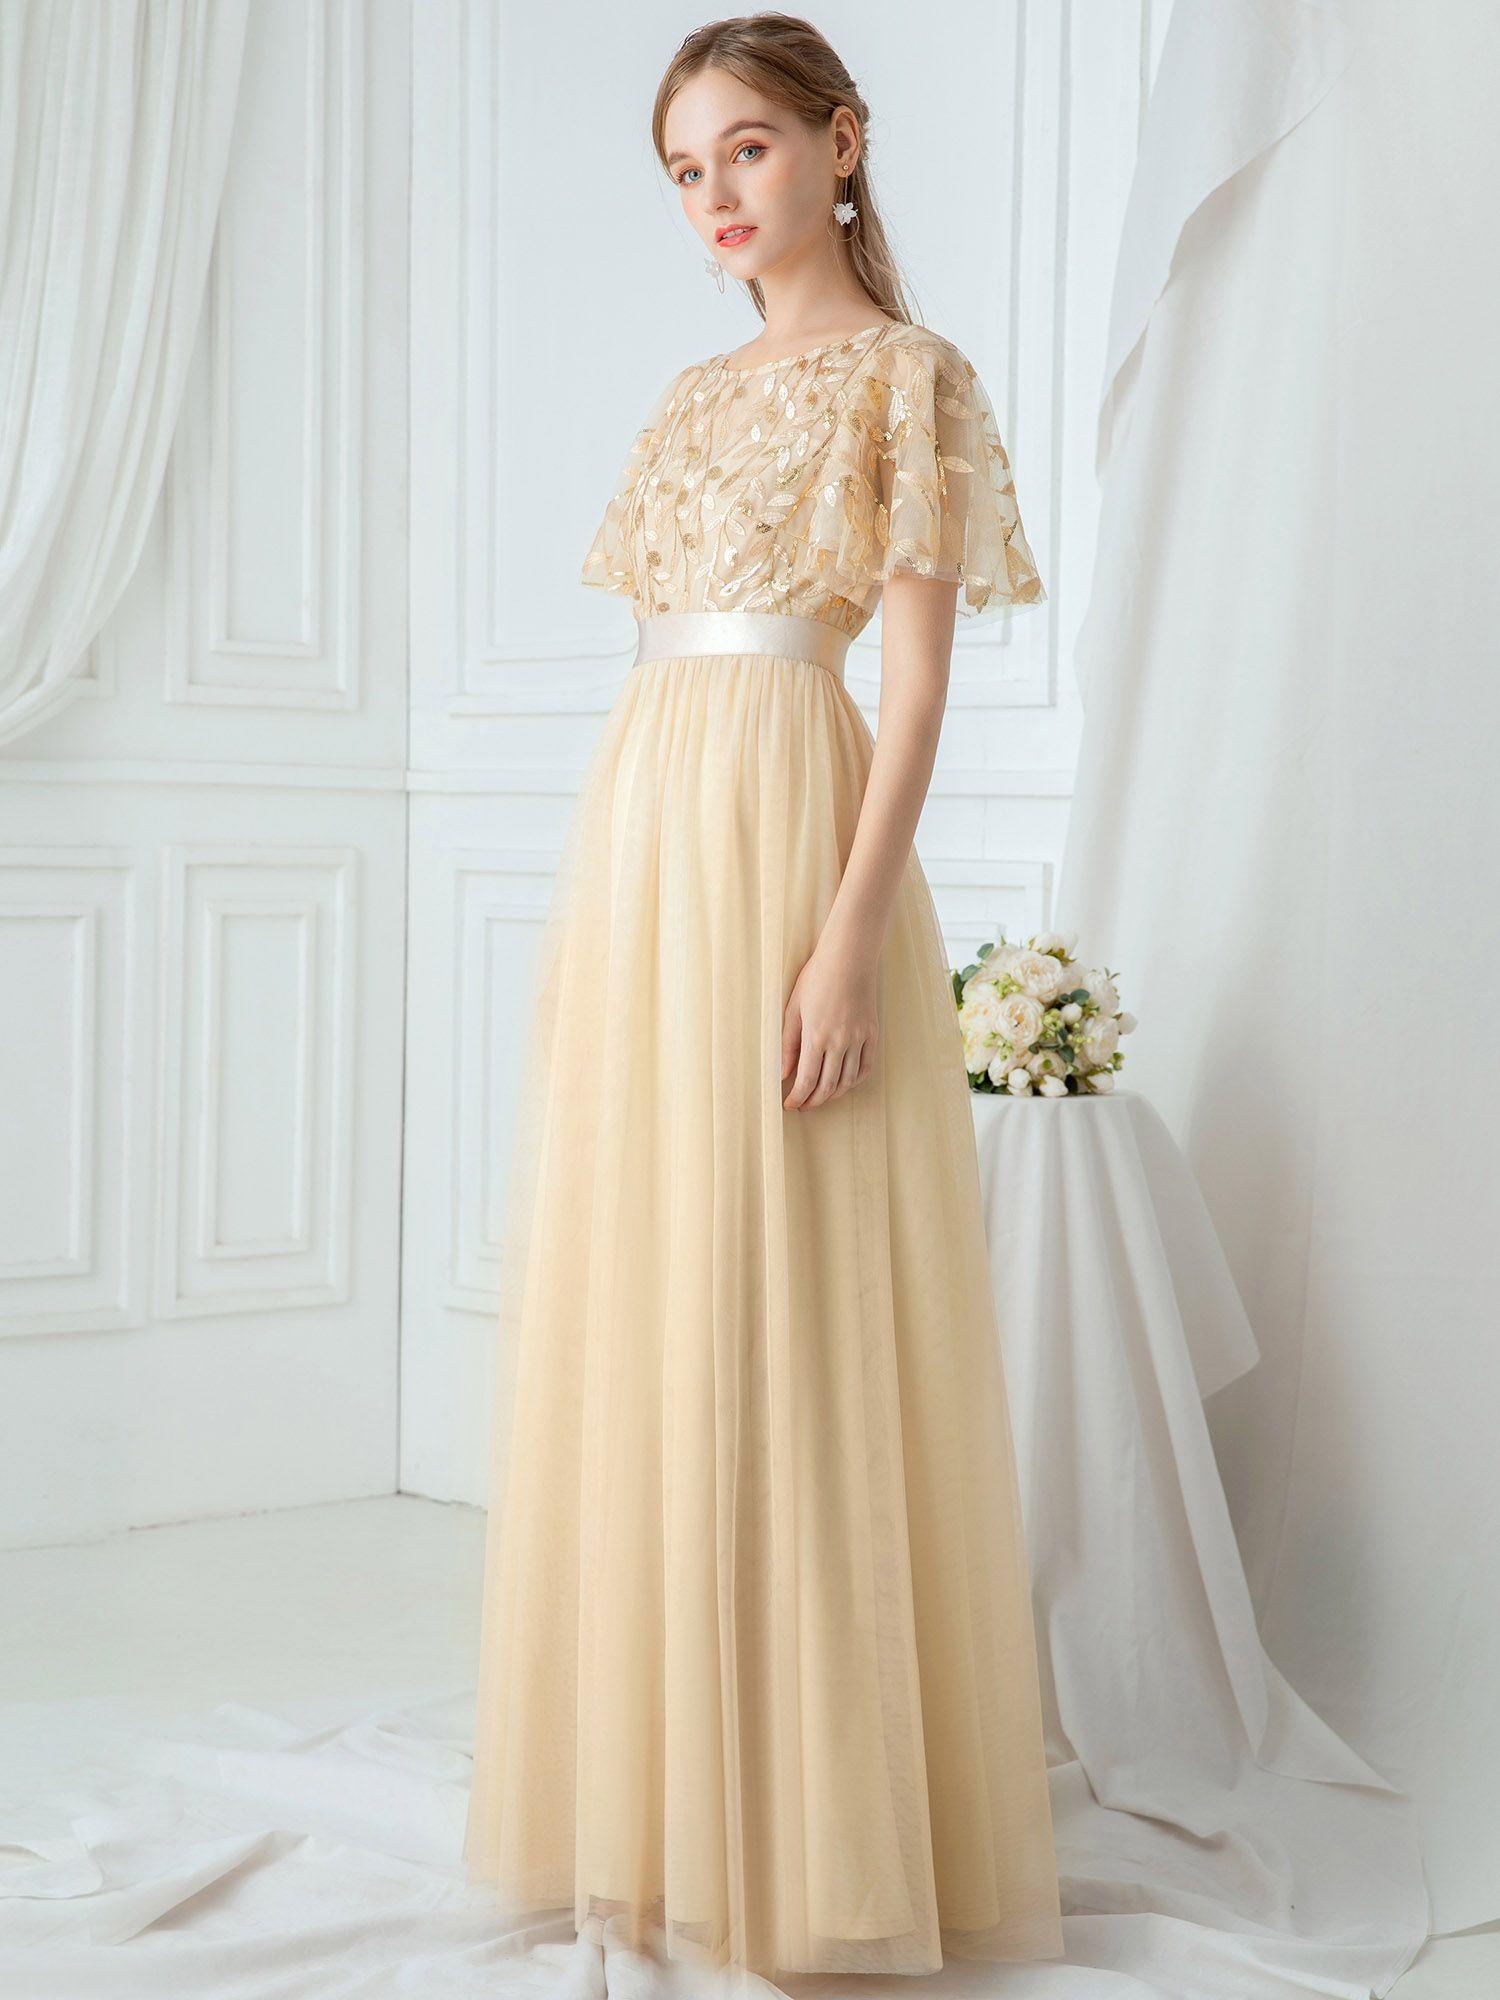 Ever Pretty Ever Pretty Womens Elegant Embroidery A Line Bridesmaid Dresses For Women 00904 Grey Us4 Walmart Com In 2021 Dresses Gold Evening Dresses Evening Dresses [ 2000 x 1500 Pixel ]